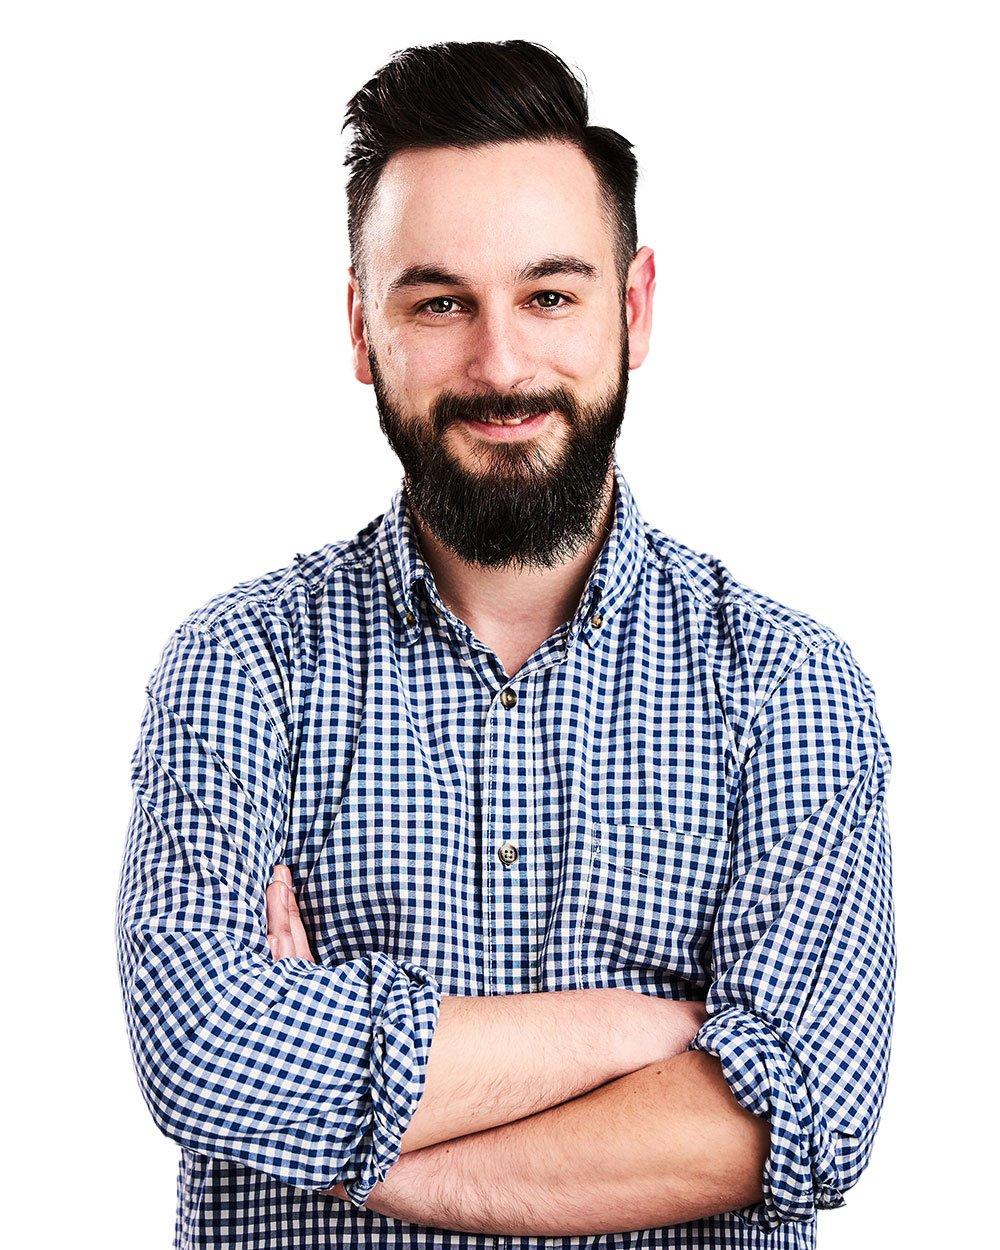 Richard - Agency Technical Director